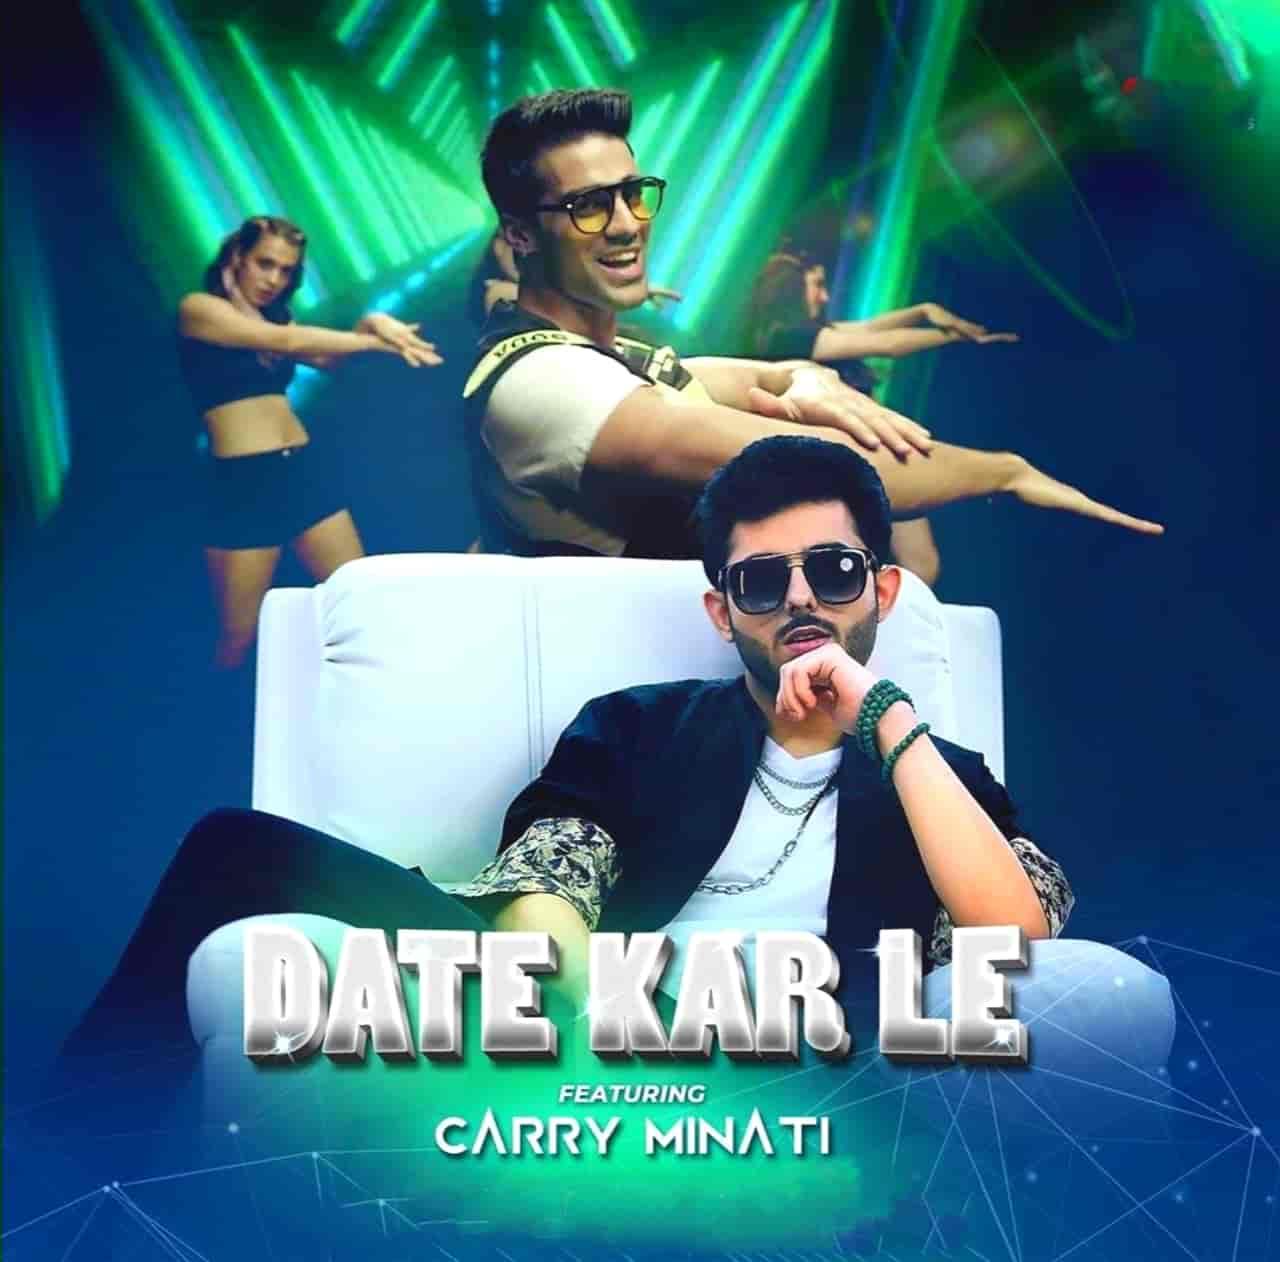 Date Kar Le Rap Song Image Features Carryminati